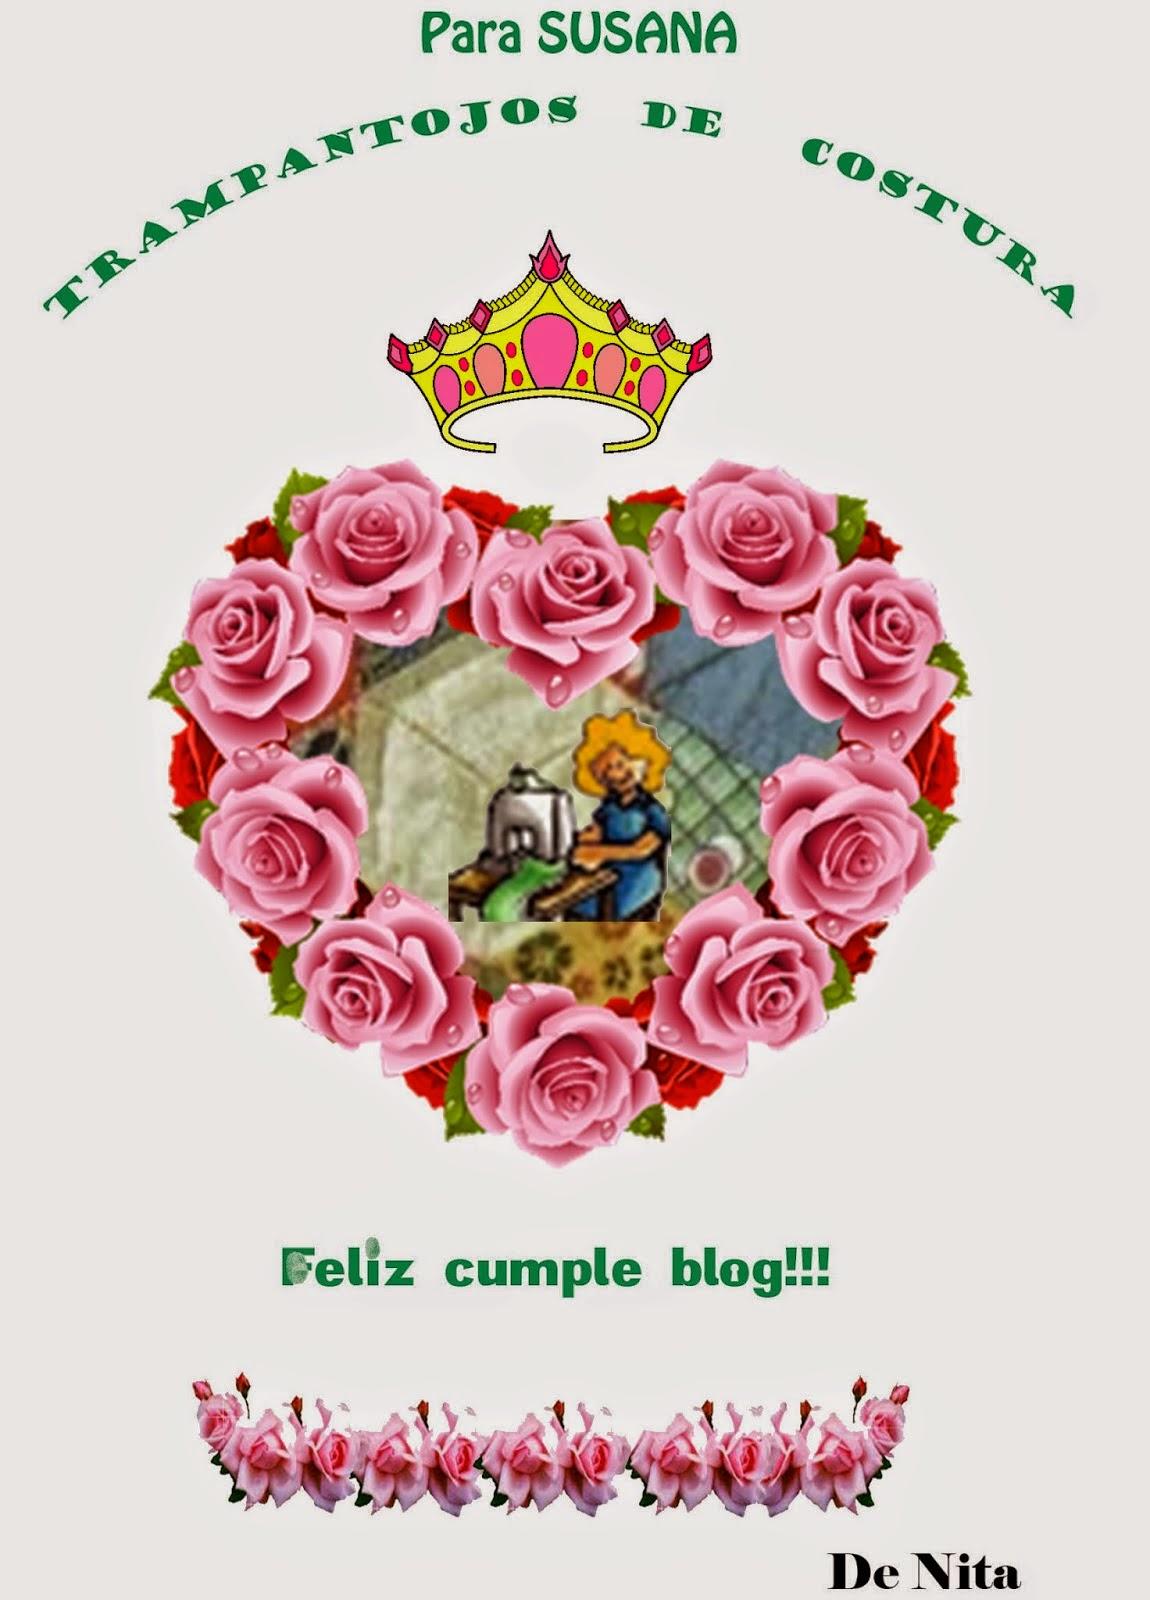 Regalo cumpleblog